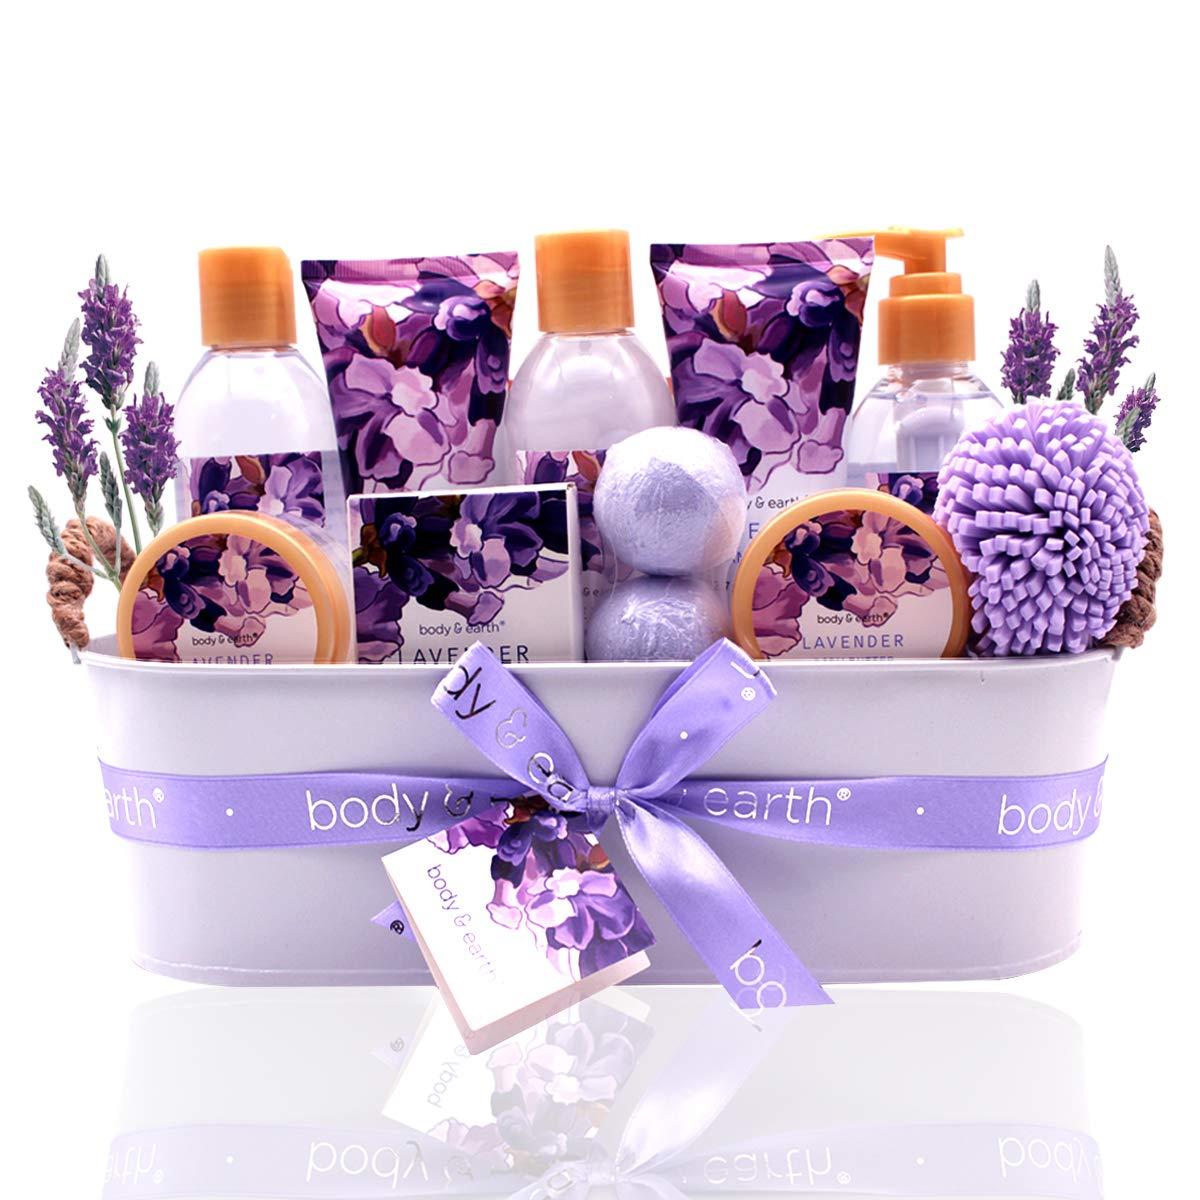 Bath Spa Gift Basket, Body & Earth Bath Gift Set 12 Pcs Lavender Scented, Includes Shower Gel, Bubble Bath, Bath Salt, Bath Bomb, Body Lotion and More, Bath and Body Gift Idea for Birthday Christmas by BODY & EARTH